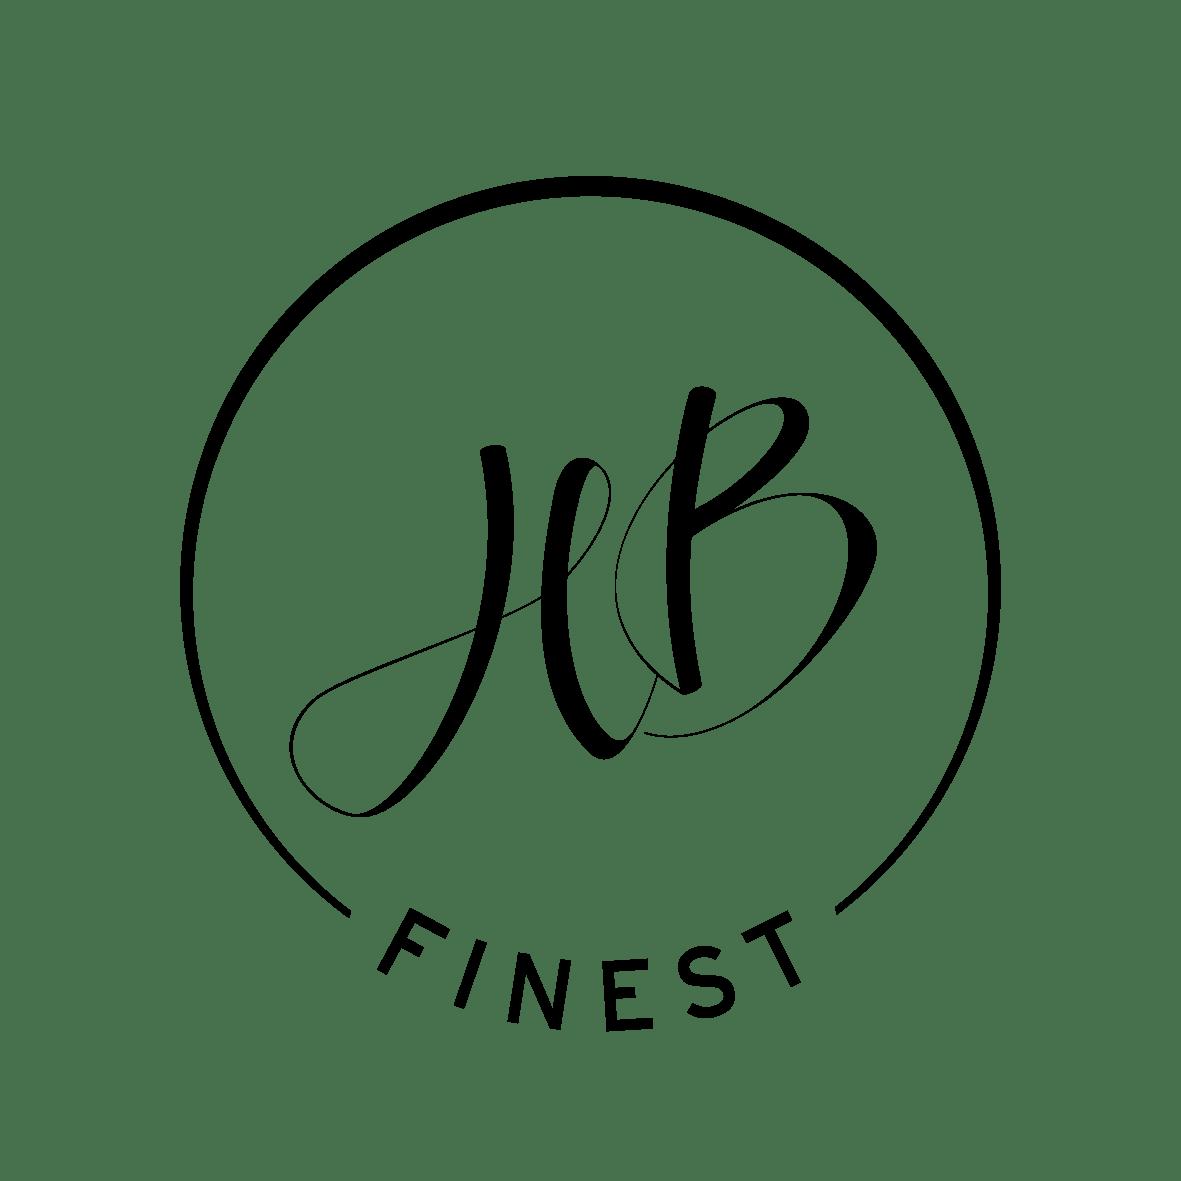 HB Finest